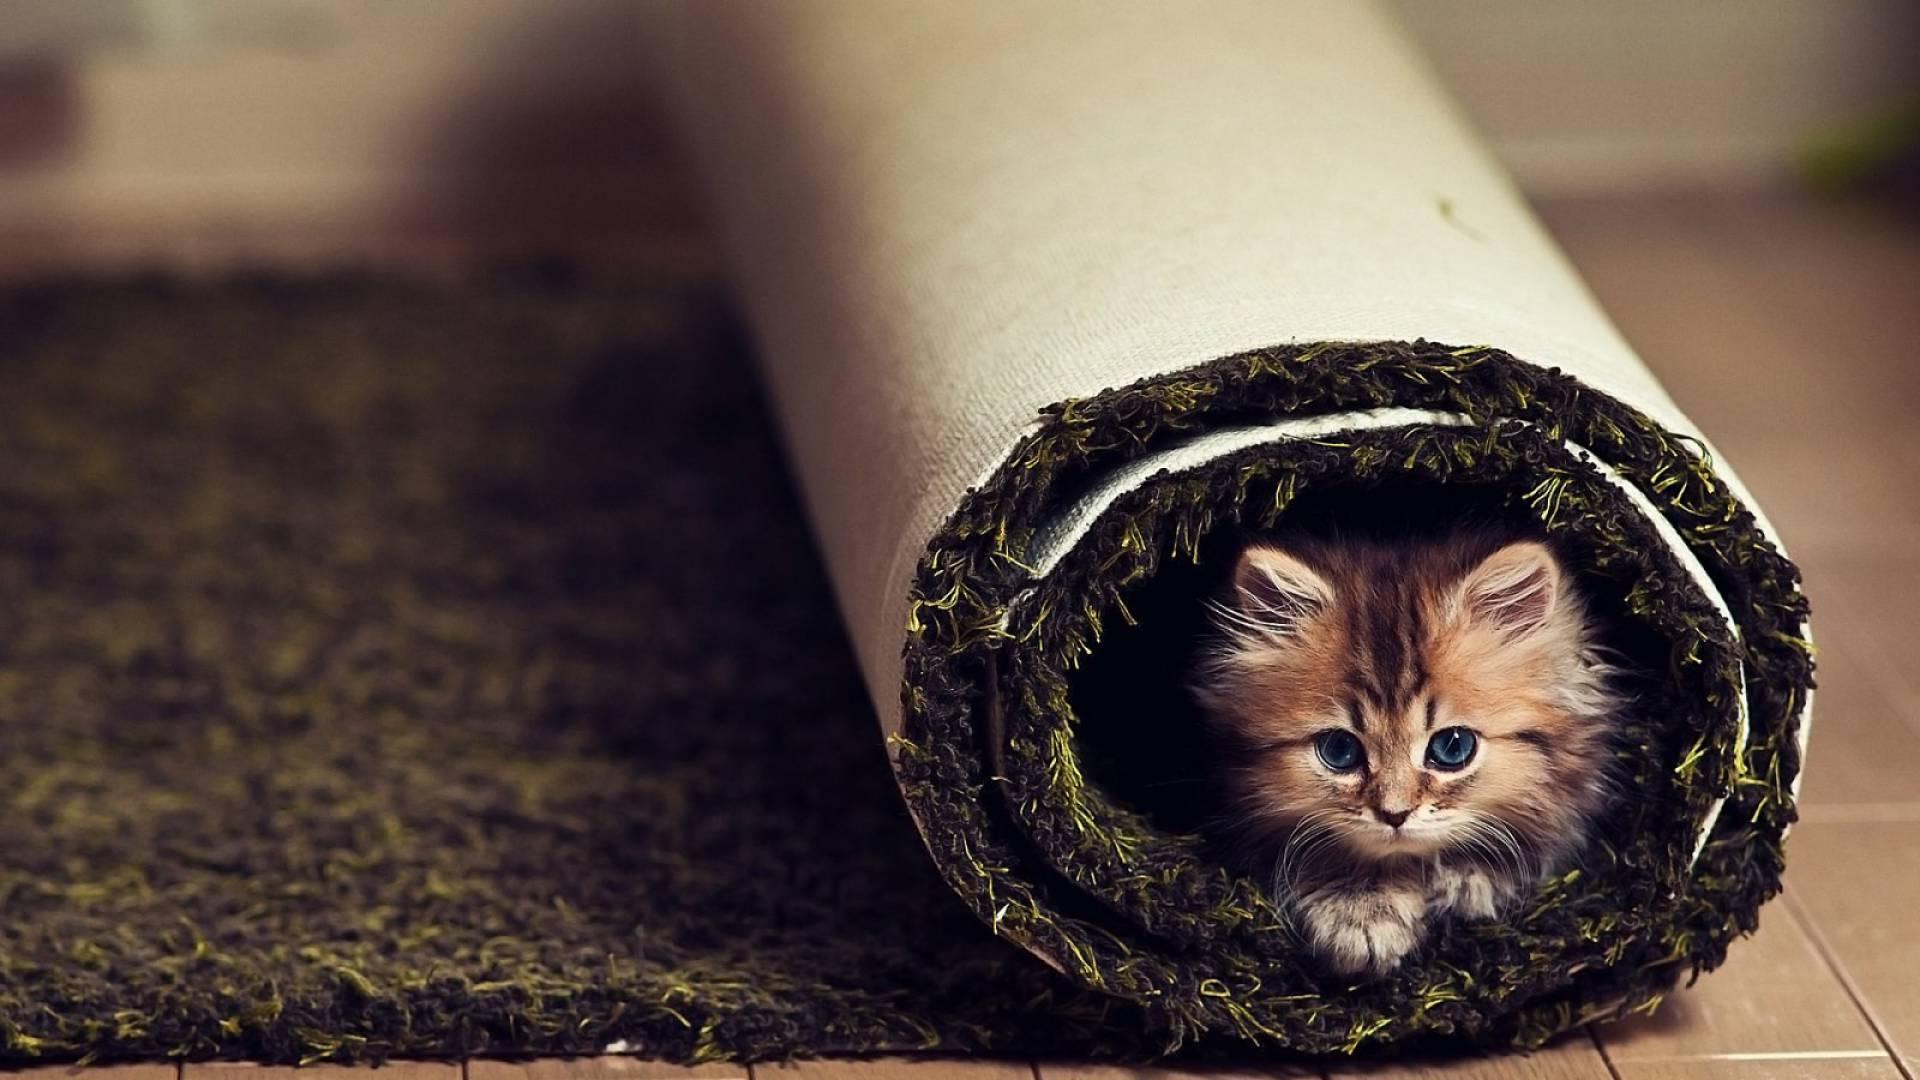 Tumblr Fondos De Pantalla De Navidad: Primer Gato